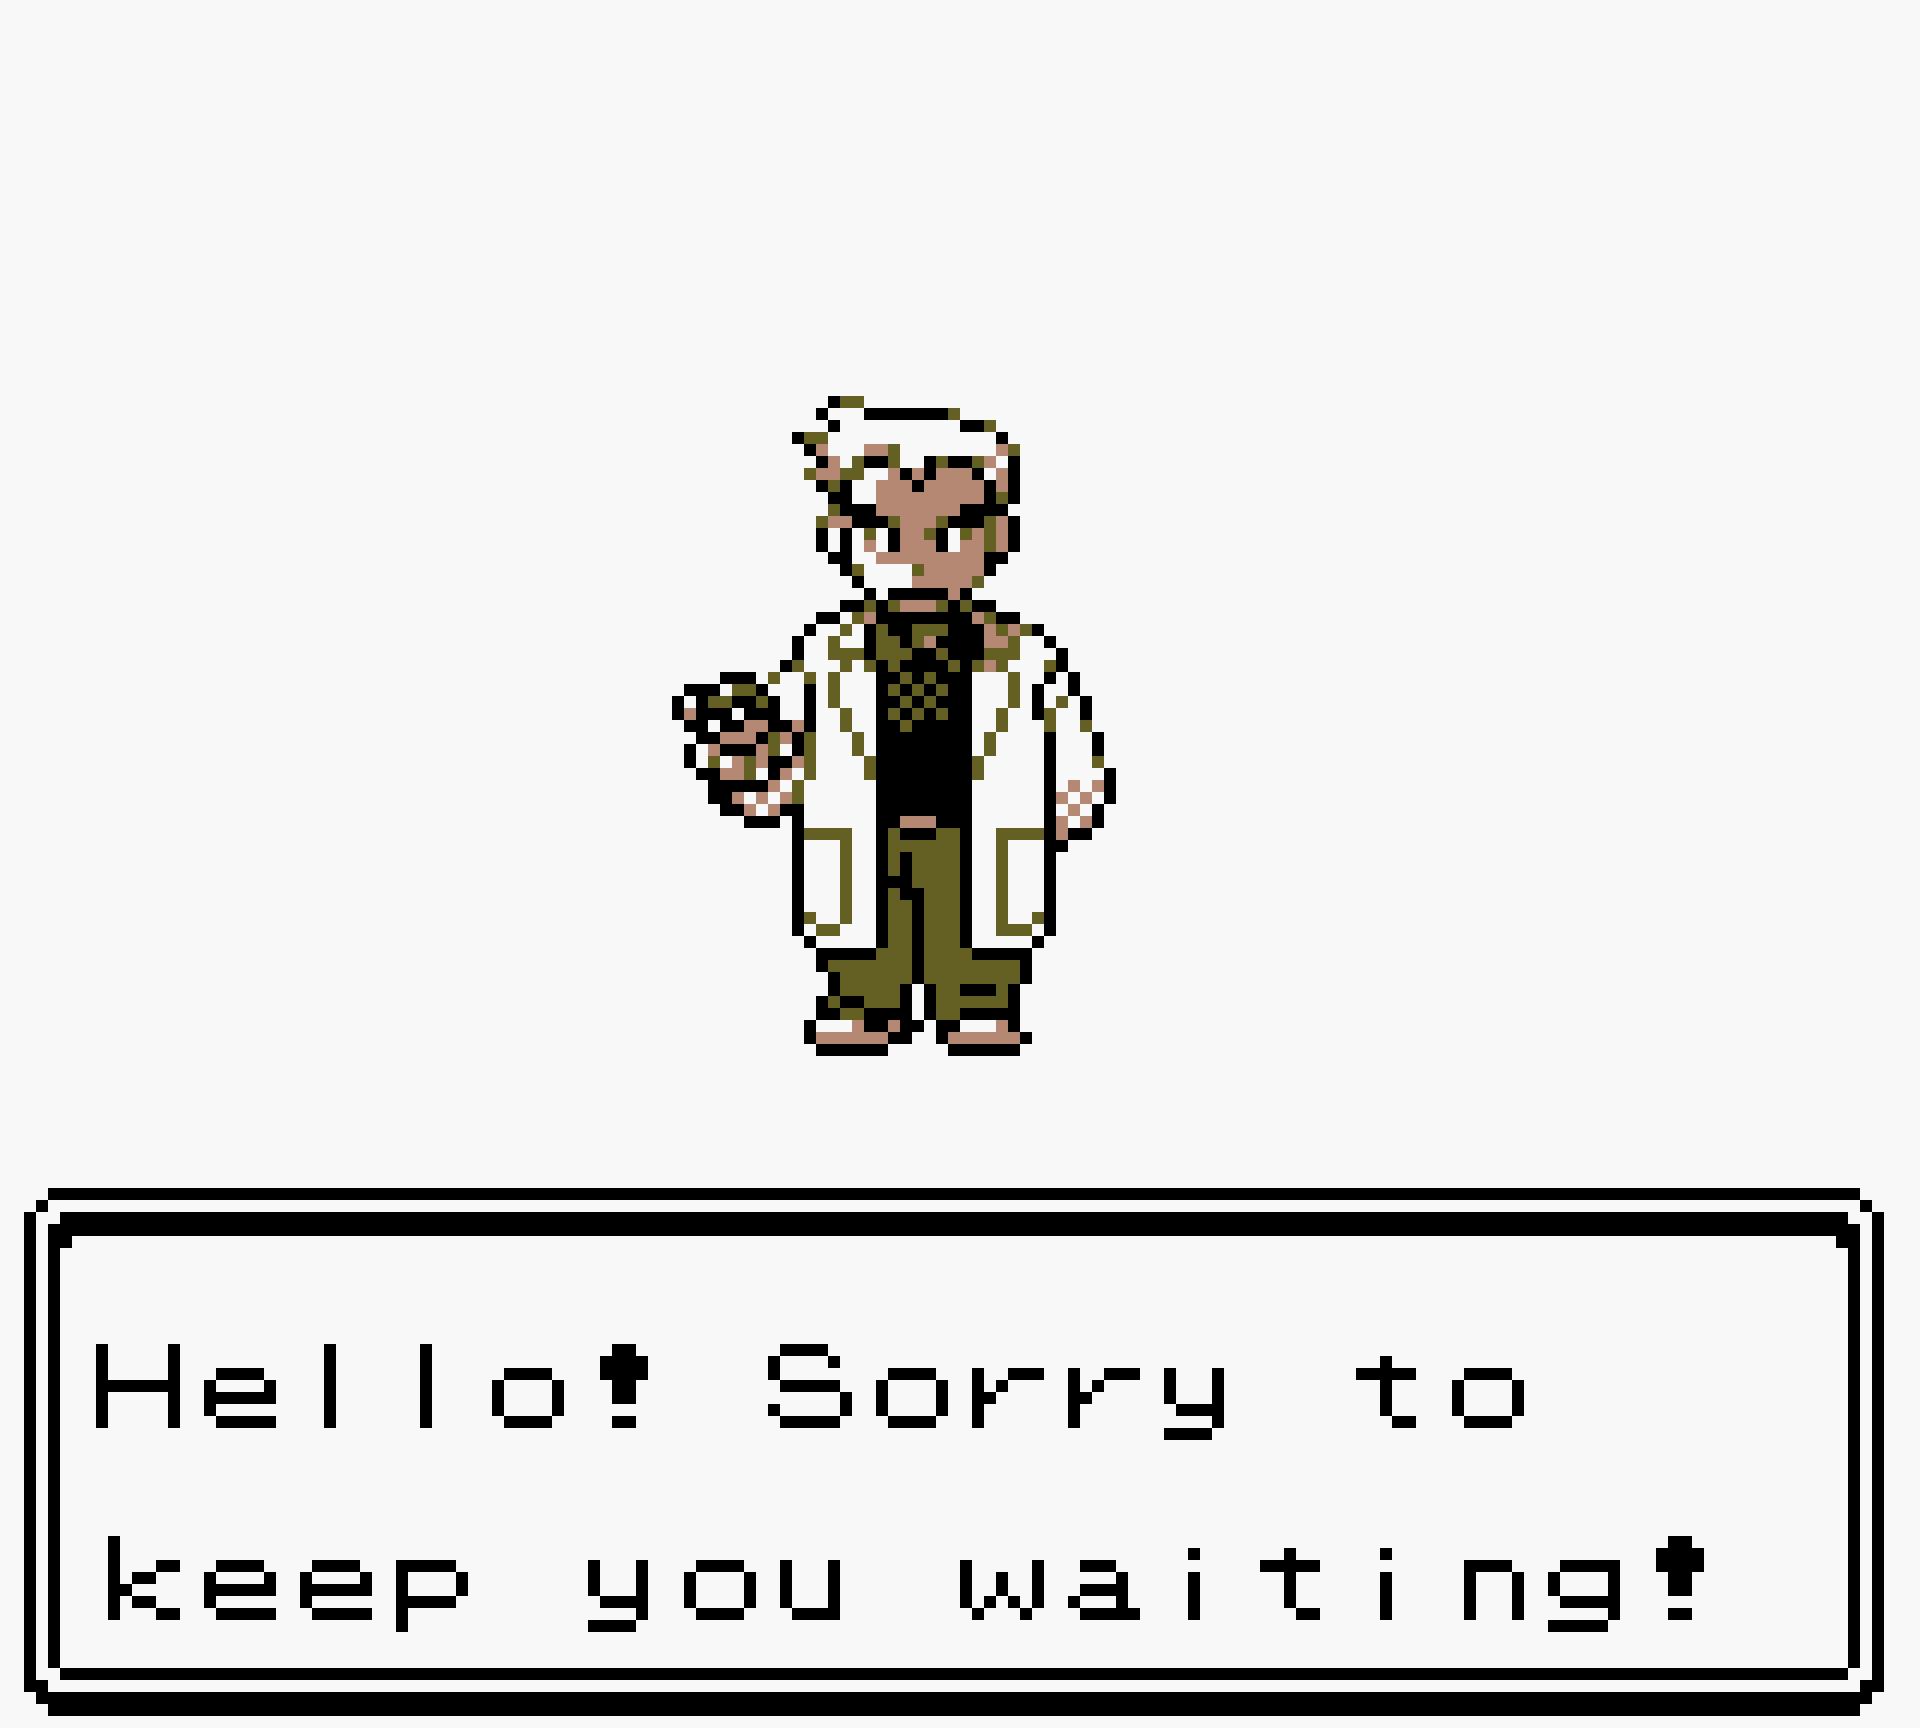 Pokemon_Crystal_Nuzlocke_2021-10-10_23.43.20.png